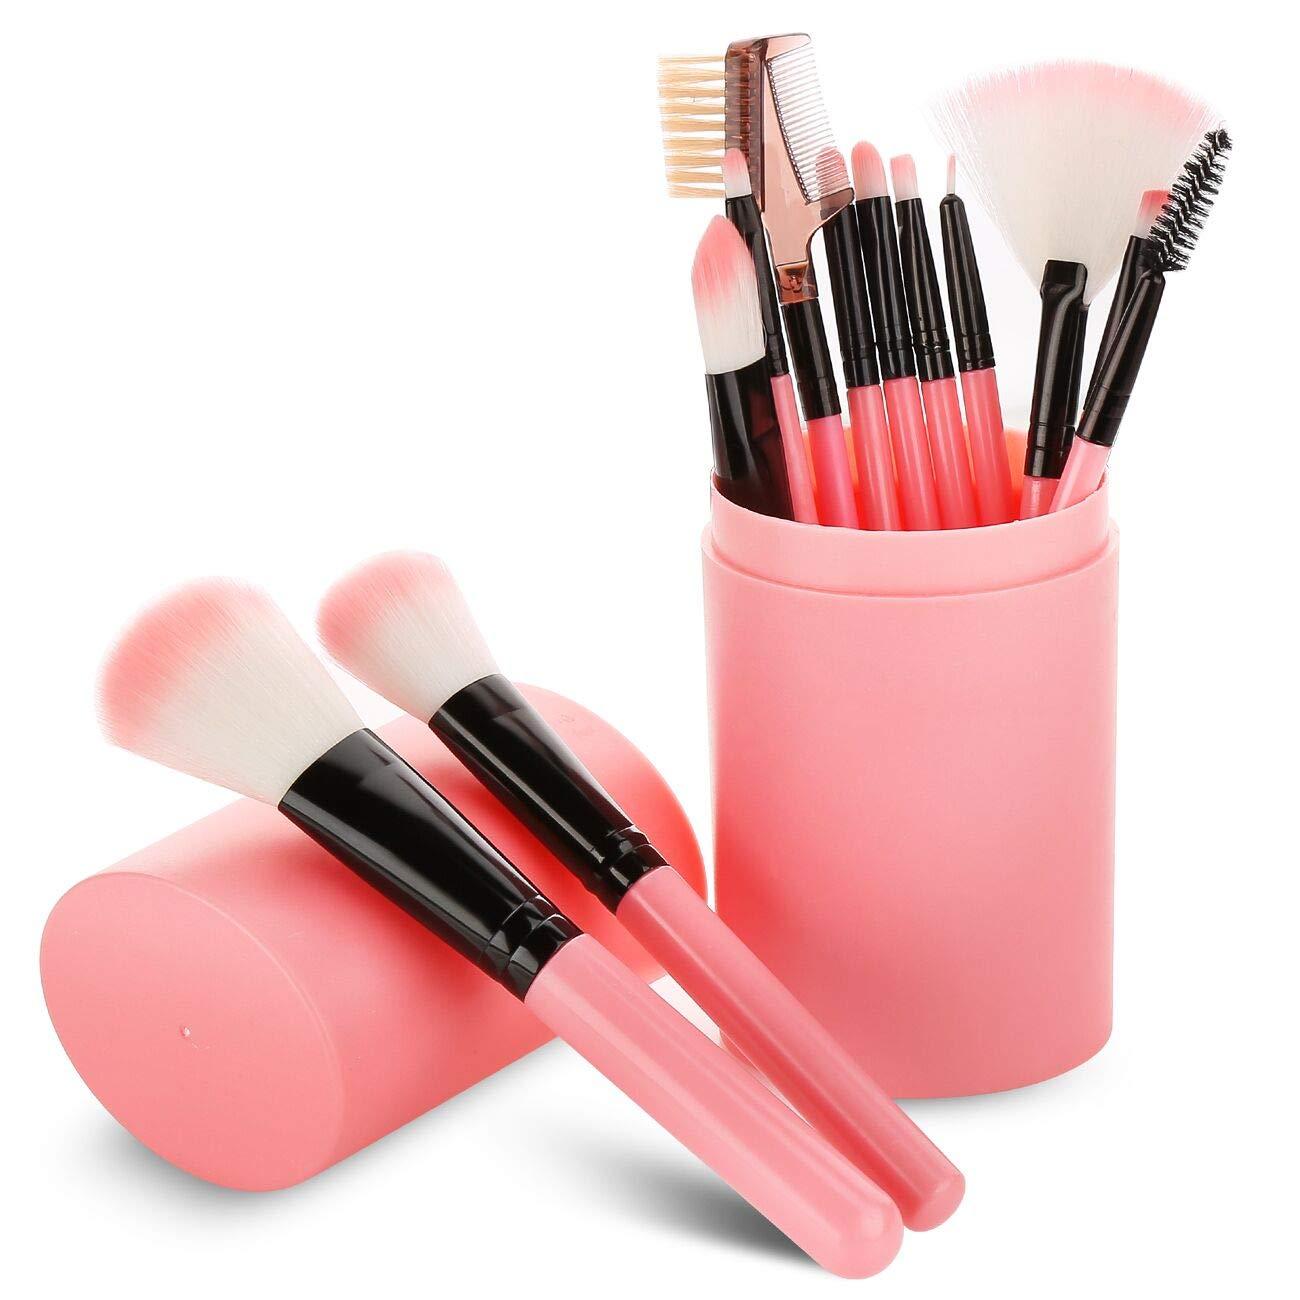 Makeup Brush Sets - 12 Pcs Makeup Brushes with Case for Foundation Eyeshadow Eyebrow Eyeliner Blush Powder Concealer Contour